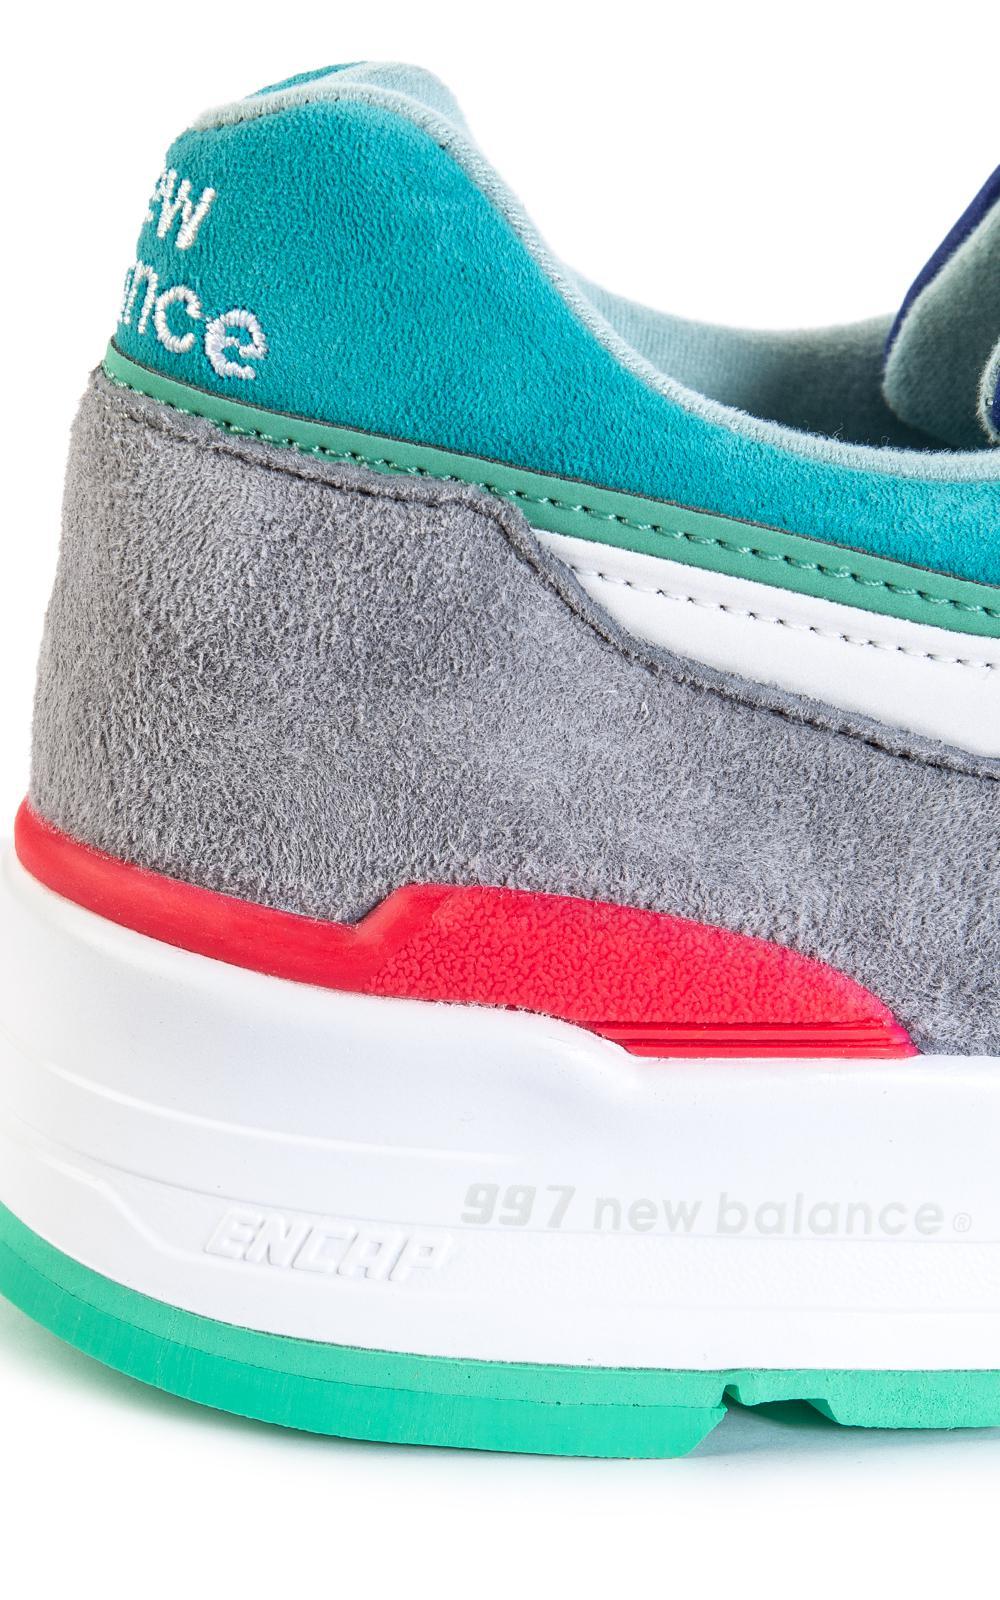 new balance 997 cdg